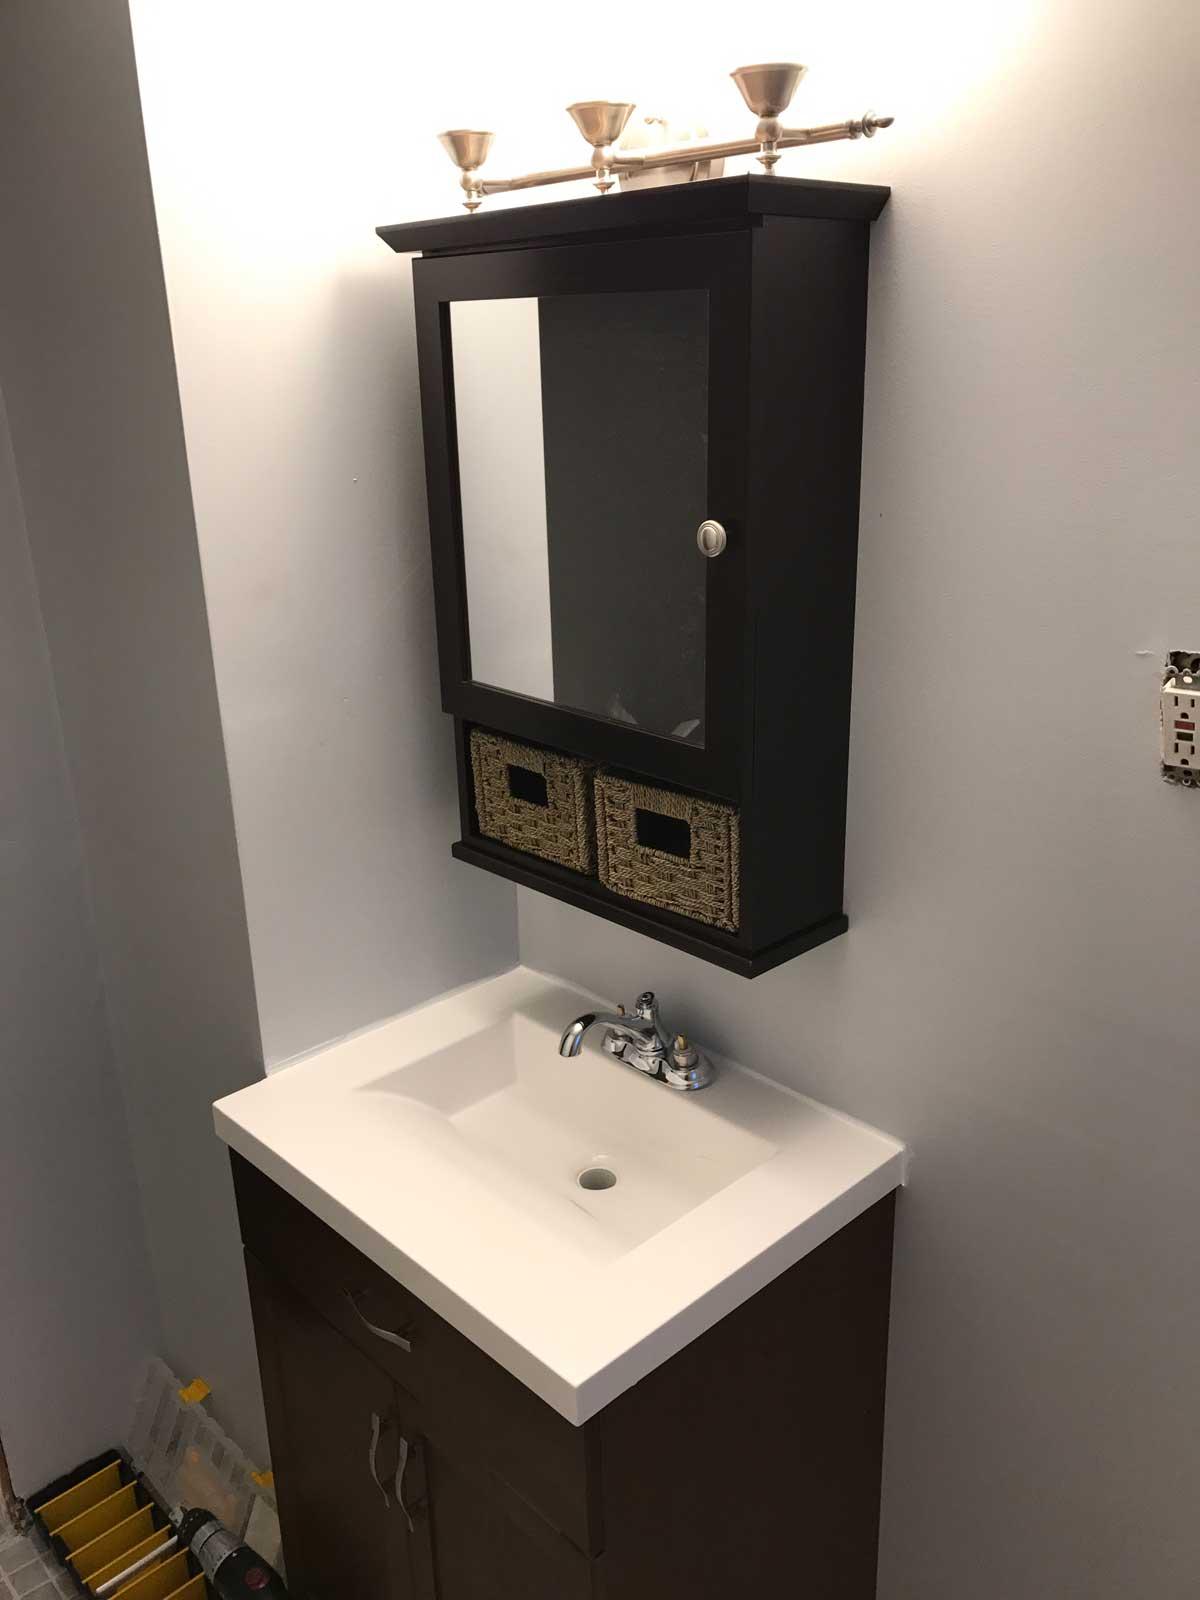 15 Day Bathroom Renovation Finishes 03